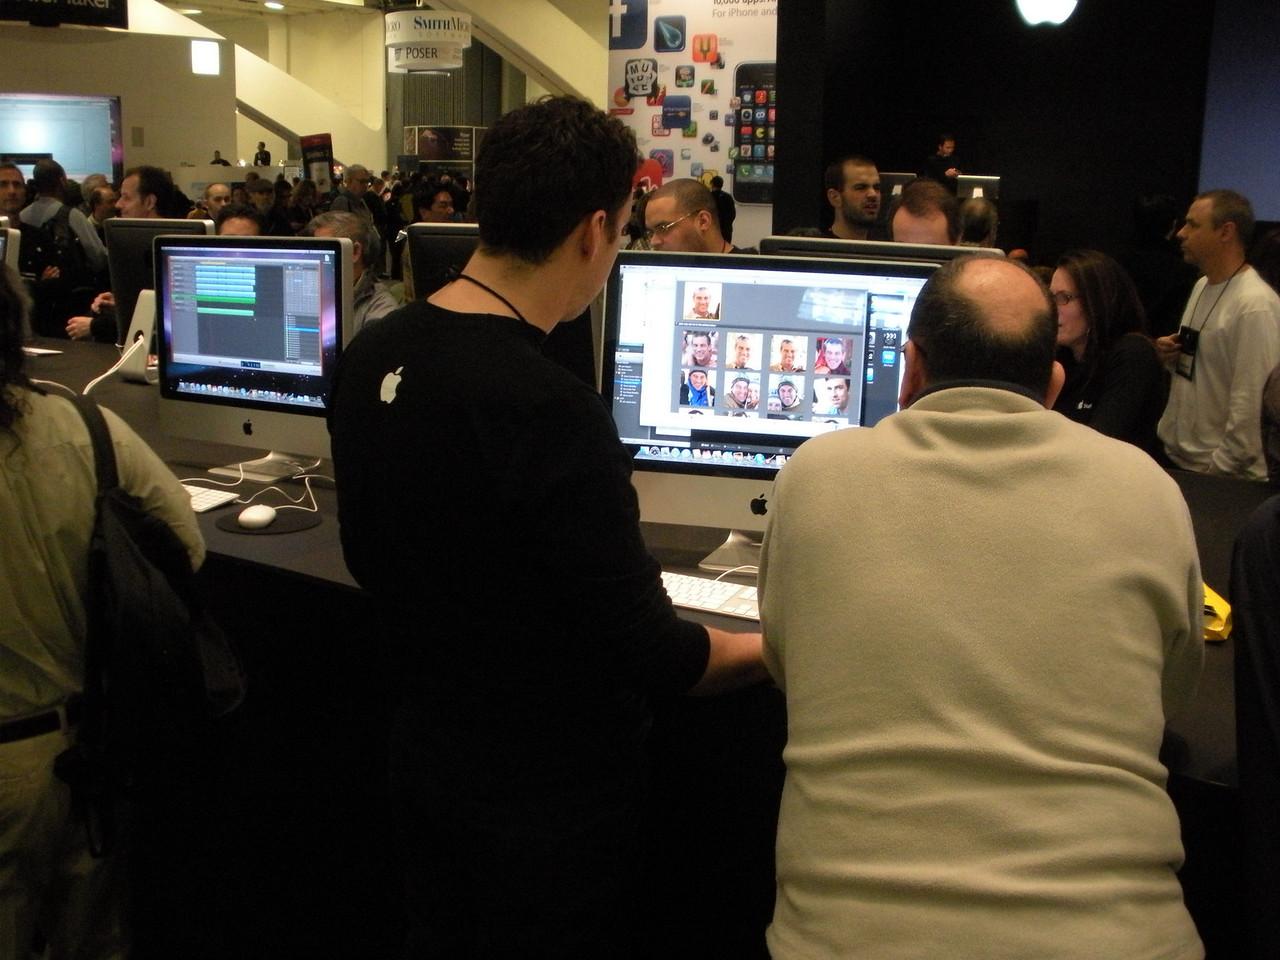 Apple-eers demonstrating software on iMacs.